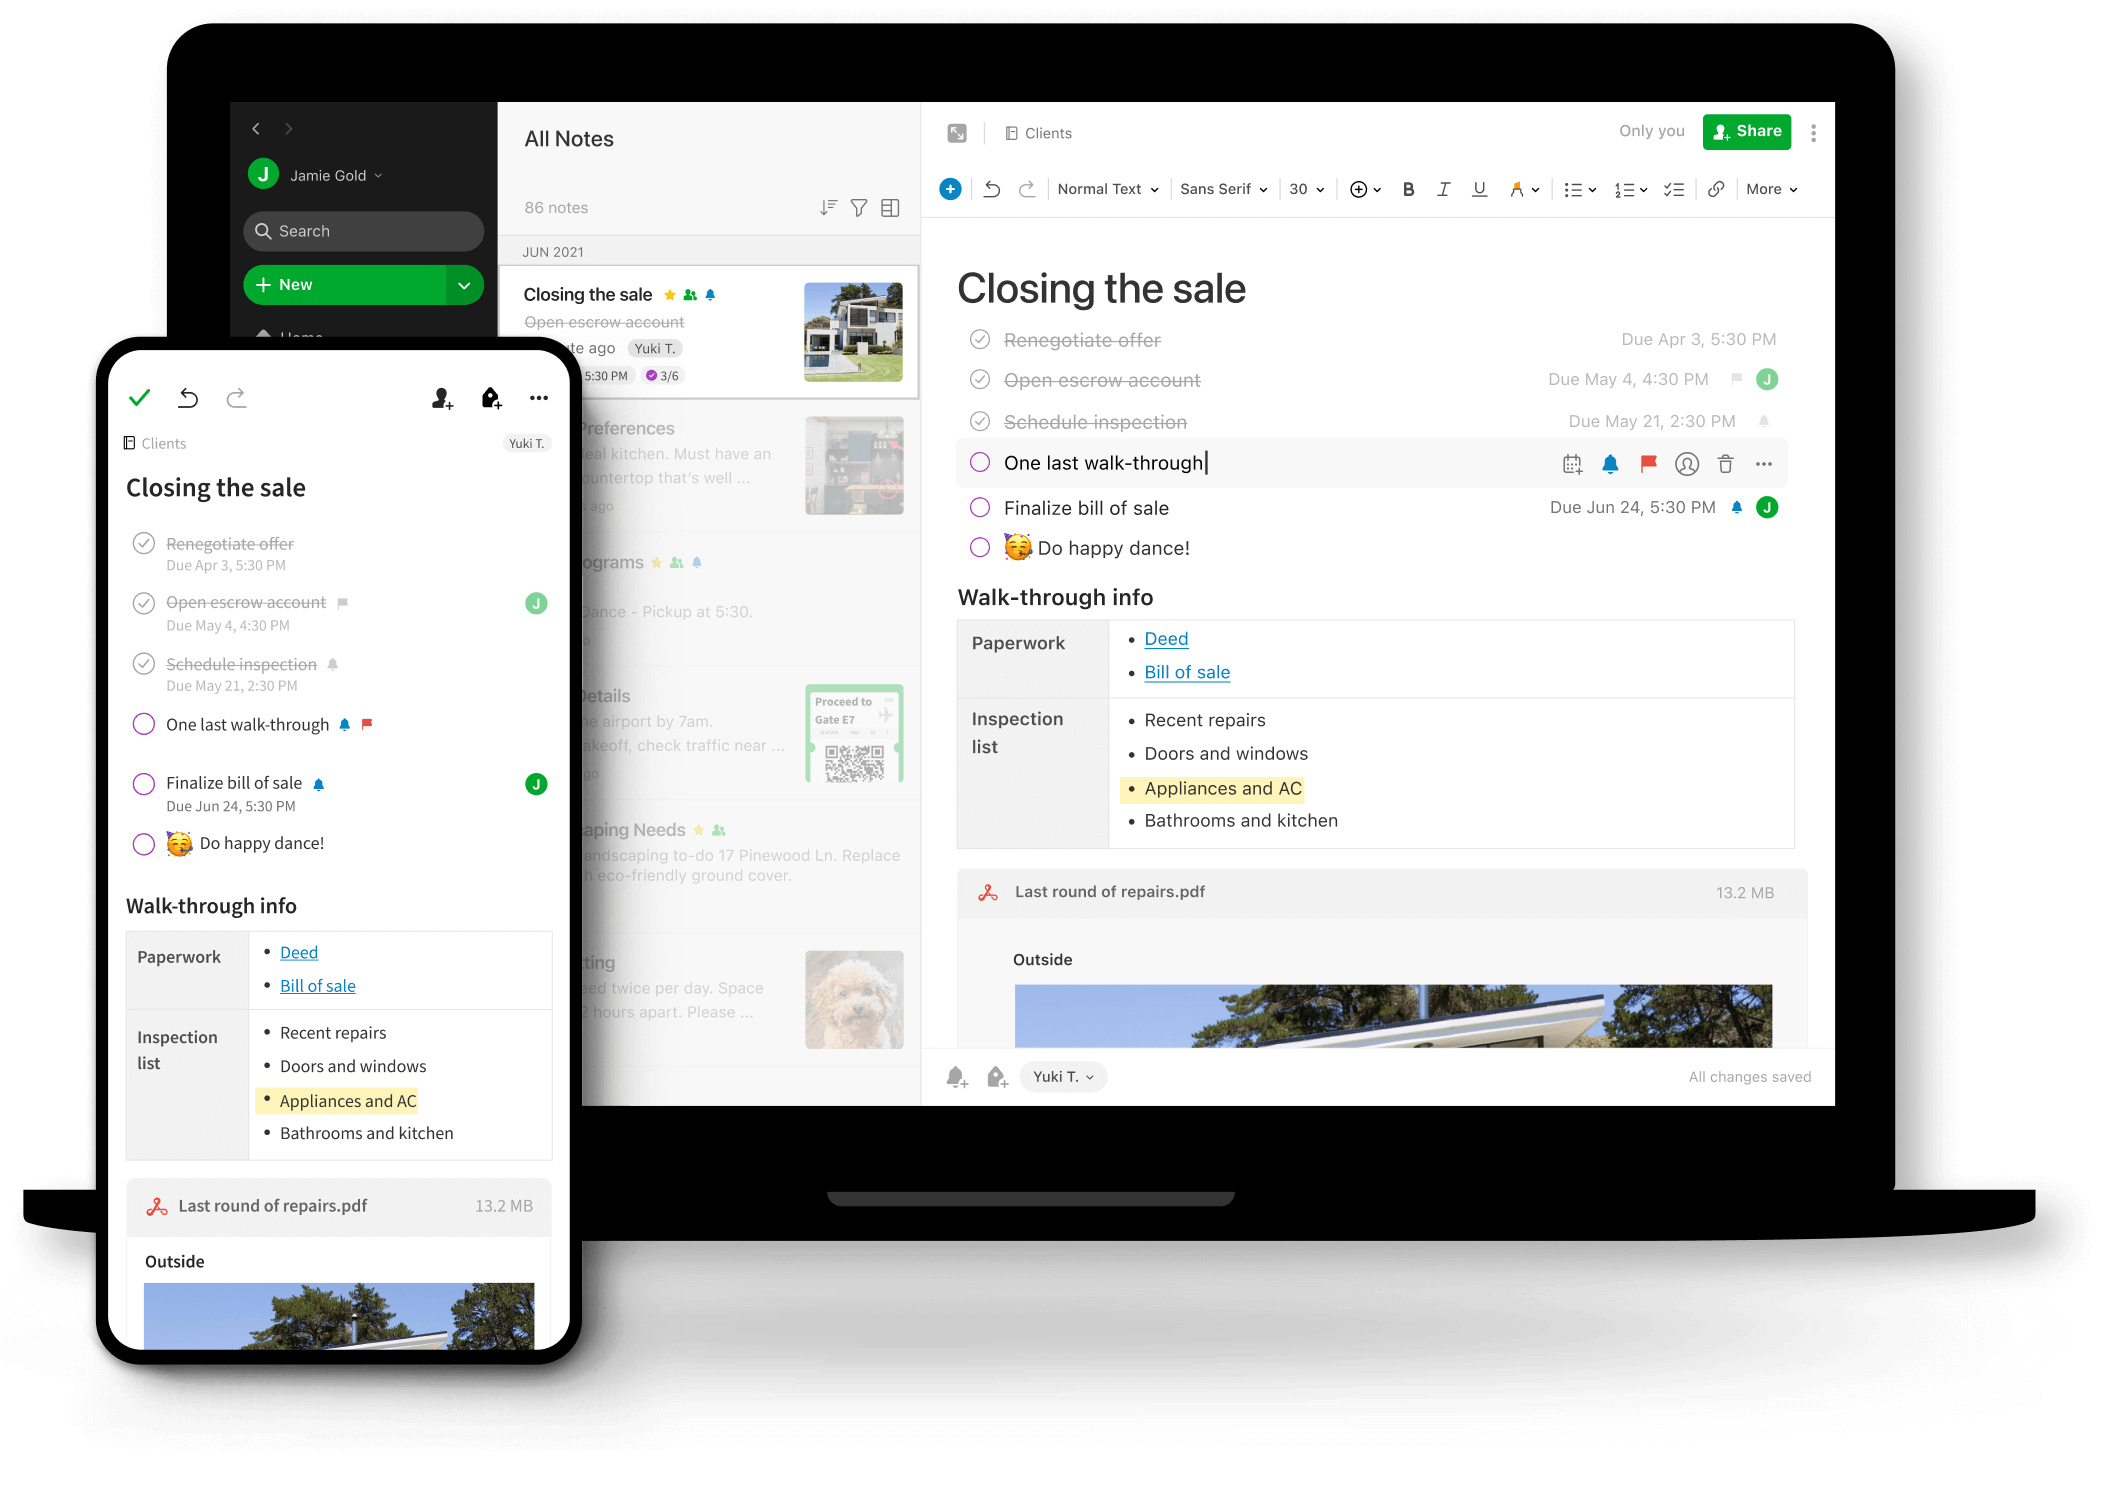 Evernote Teams Software - Sharing between mobile and desktop.